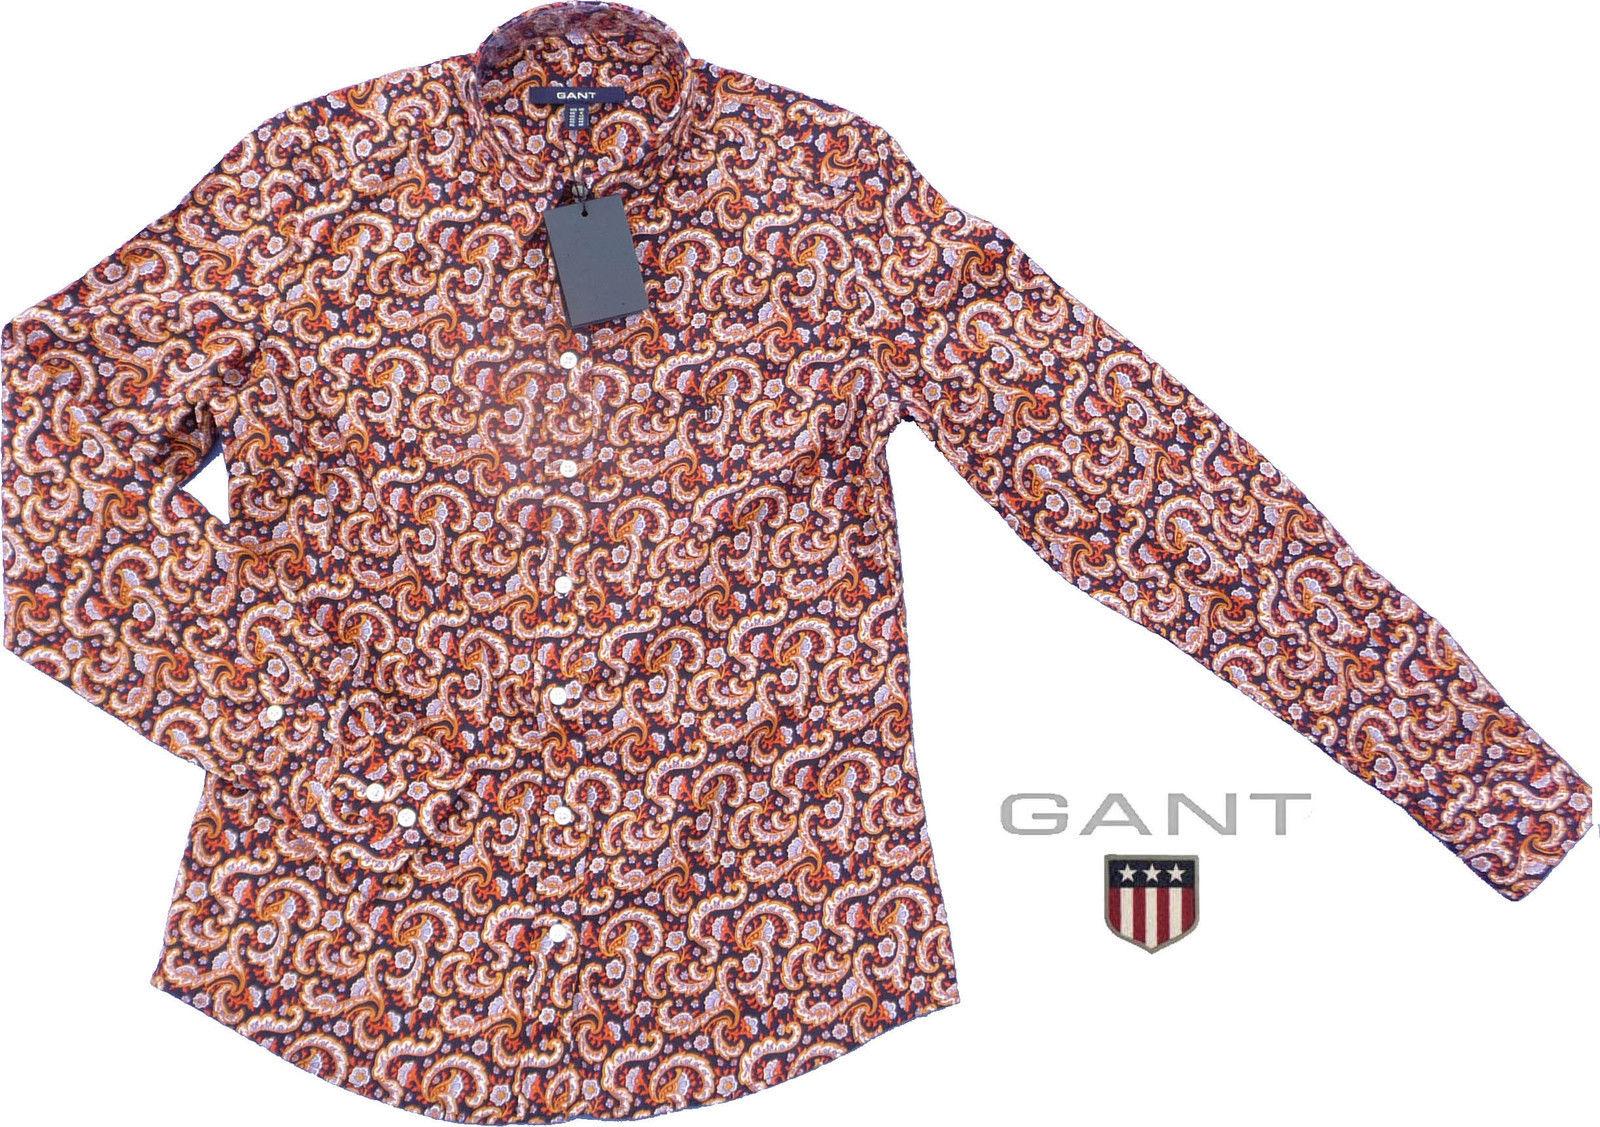 Gant - Bluse Co Pop Stretch Paisley - viele Größen - Neu